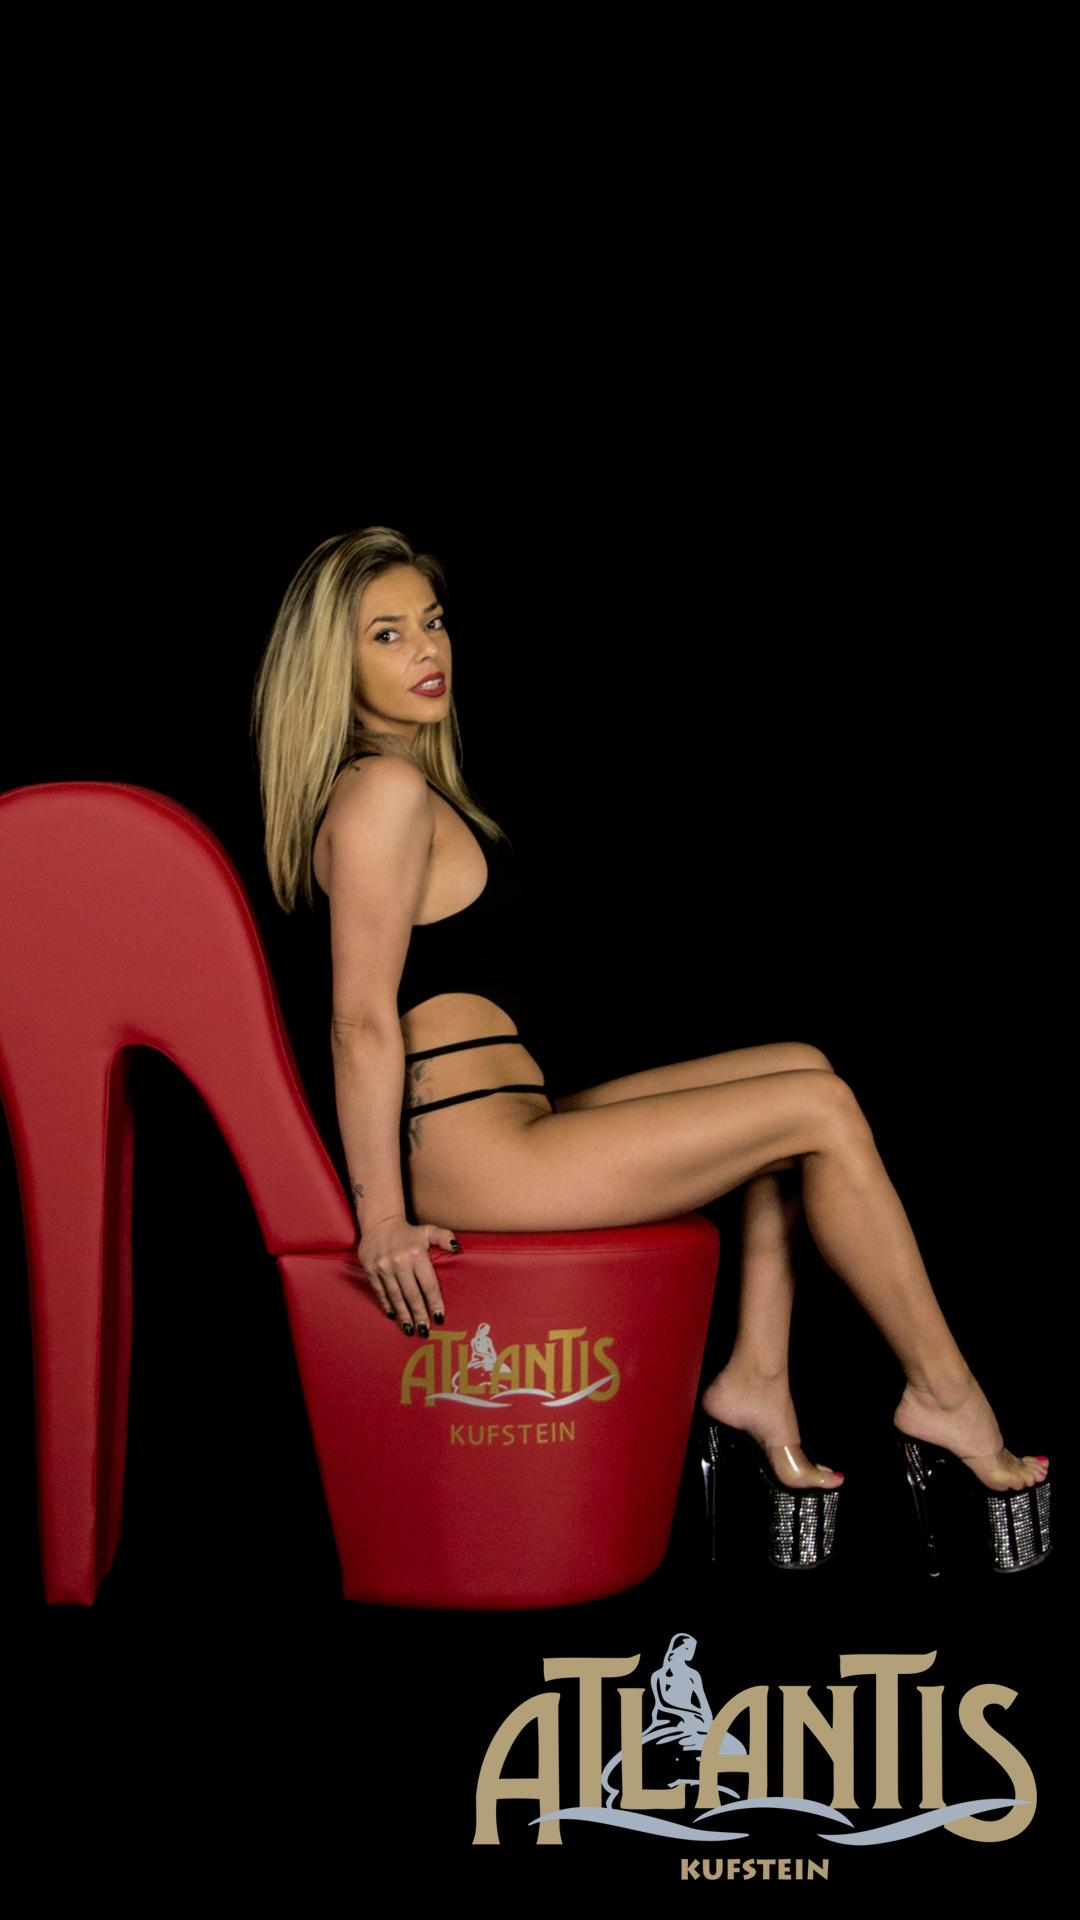 Ana die große schlanke Atlantis Lady